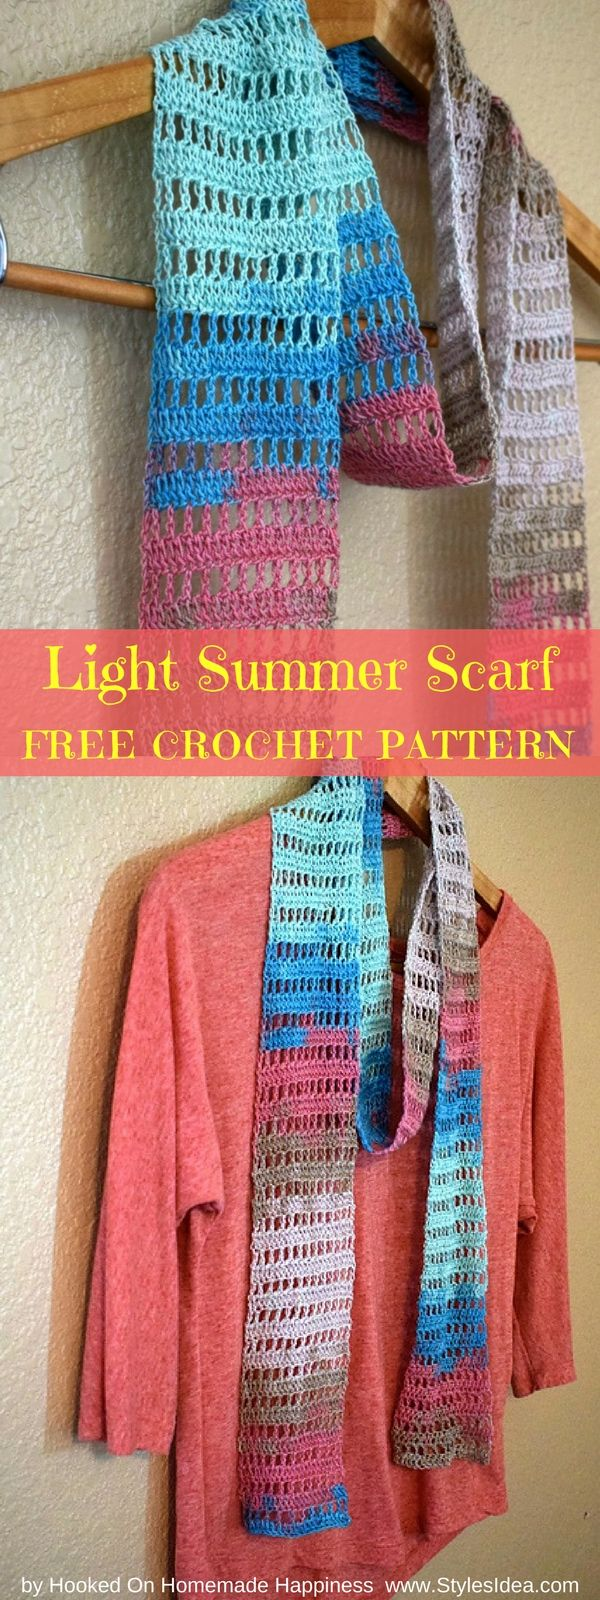 6958 Best Proyectos En Crochet Images On Pinterest Scarves All Shawl Stitch Diagrams Doris Chan Torso Scarf Written Pdf Us Terms Yarn Katia Jaipur Hook